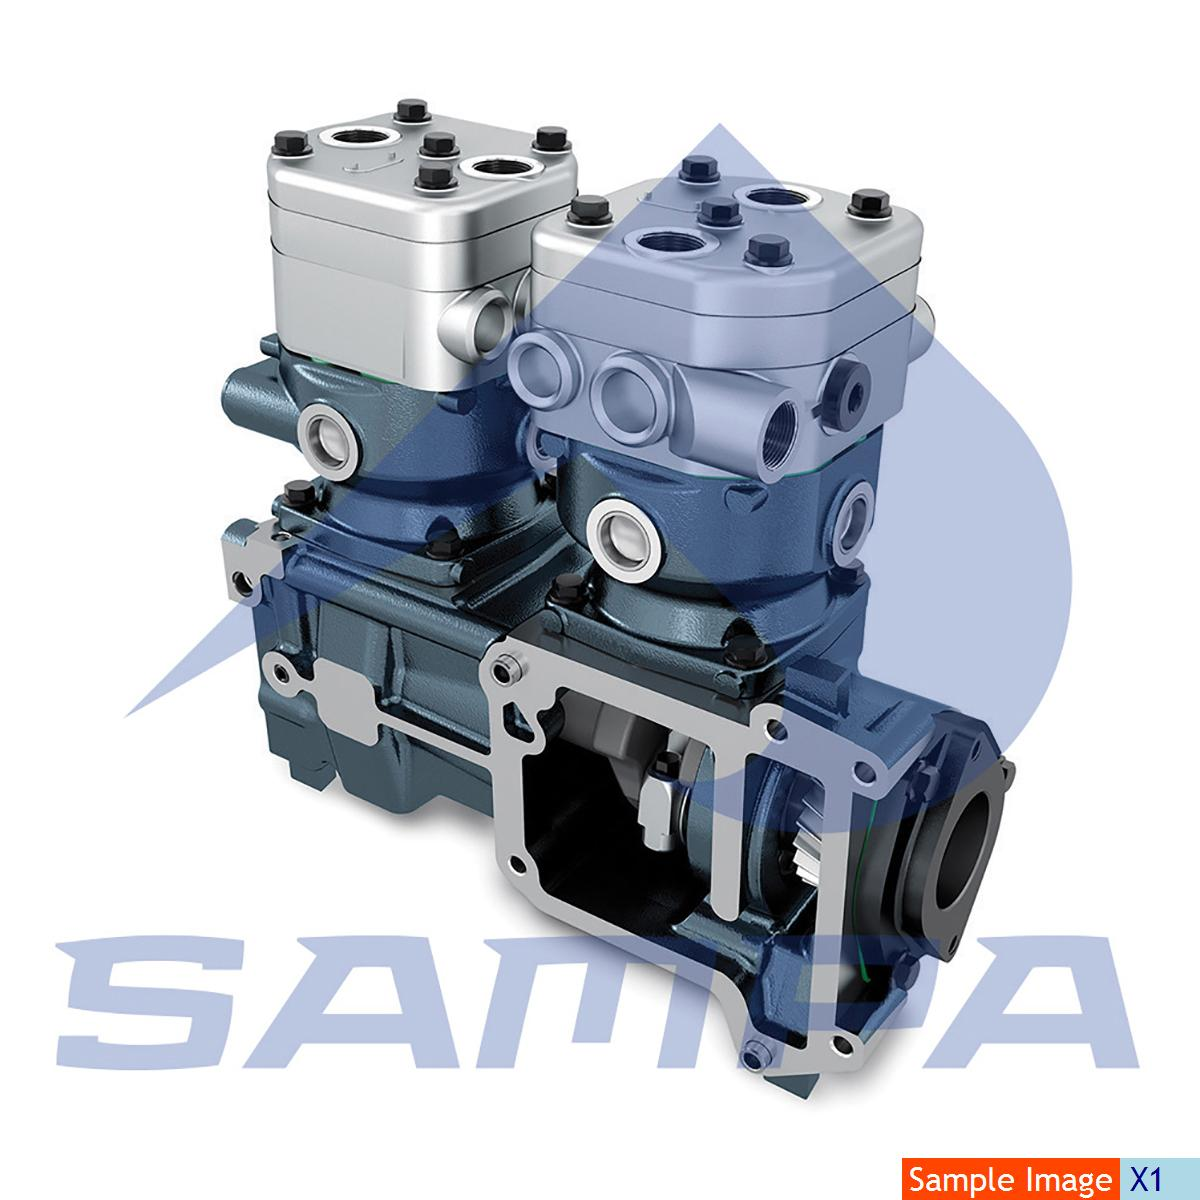 Compressor, Man, Compressed Air System